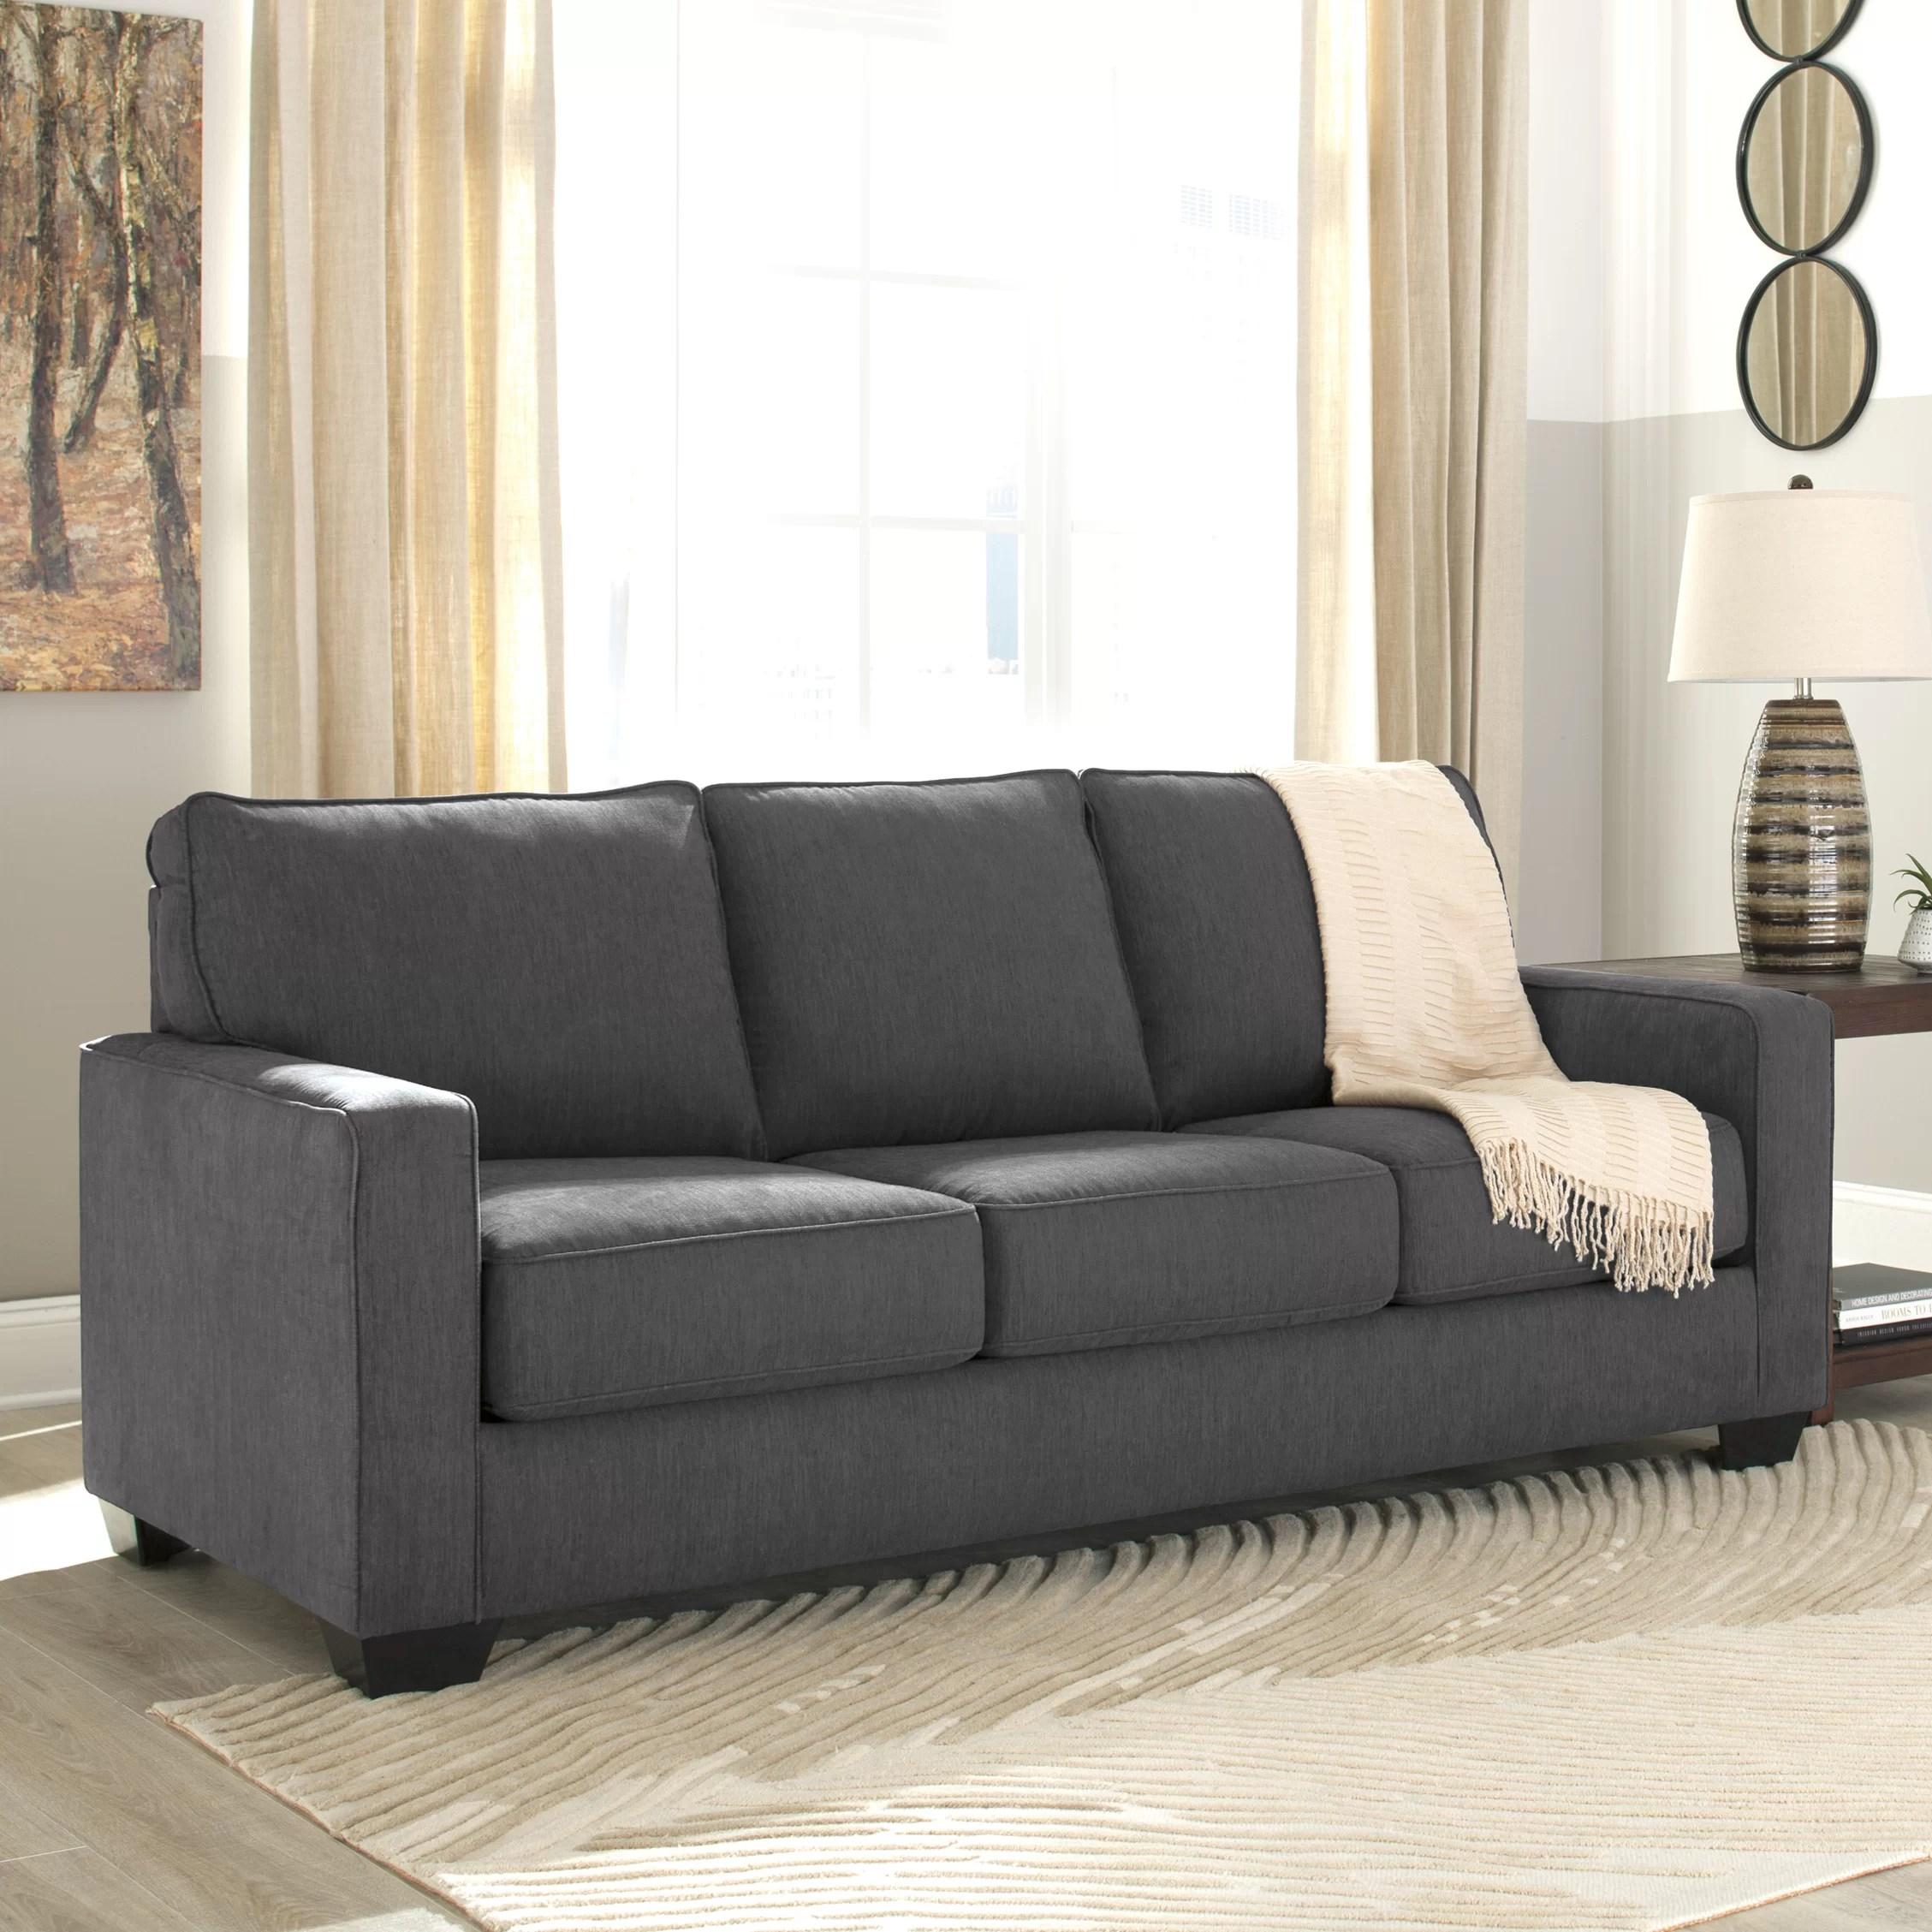 Benchcraft Zeb Queen Sleeper Sofa  Reviews  Wayfairca